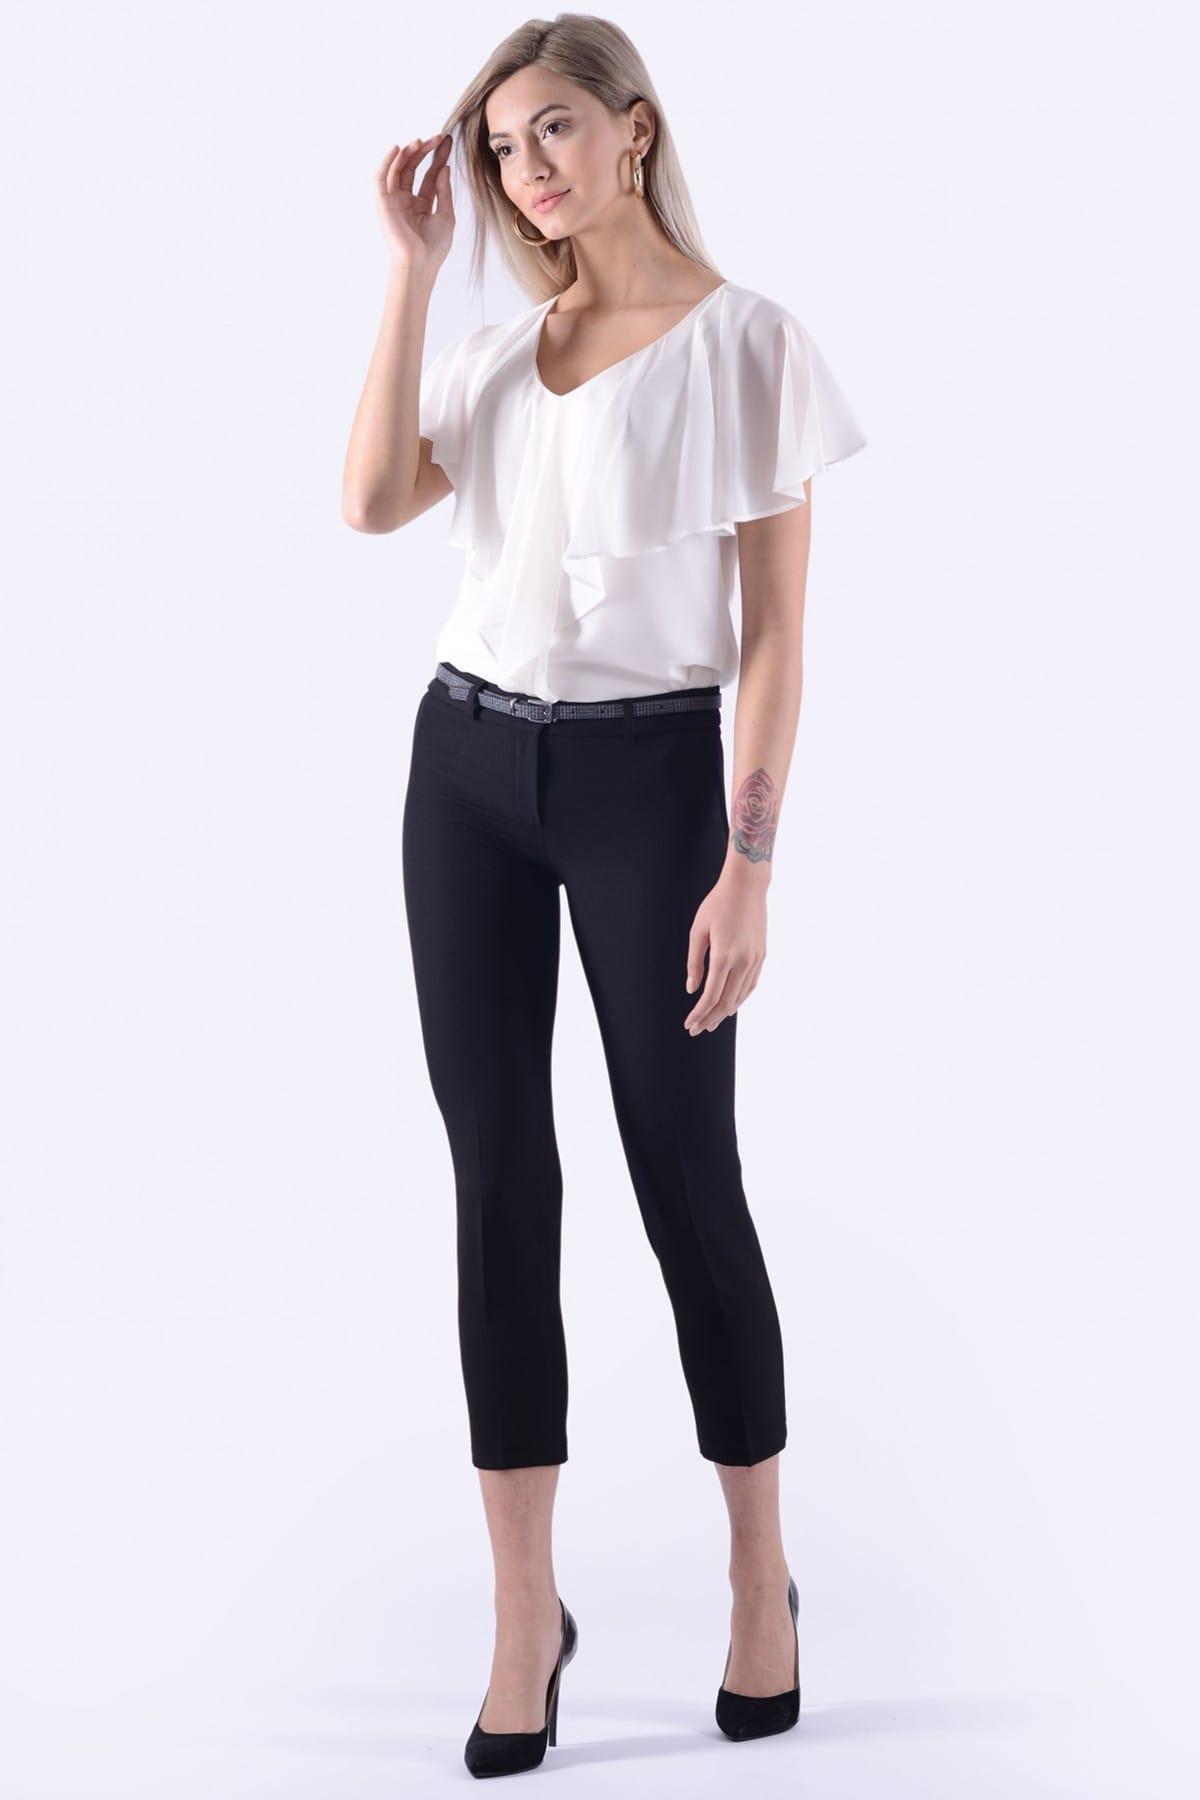 İroni Kadın Siyah Dar Paça Kumaş Pantolon 1581-891K 1